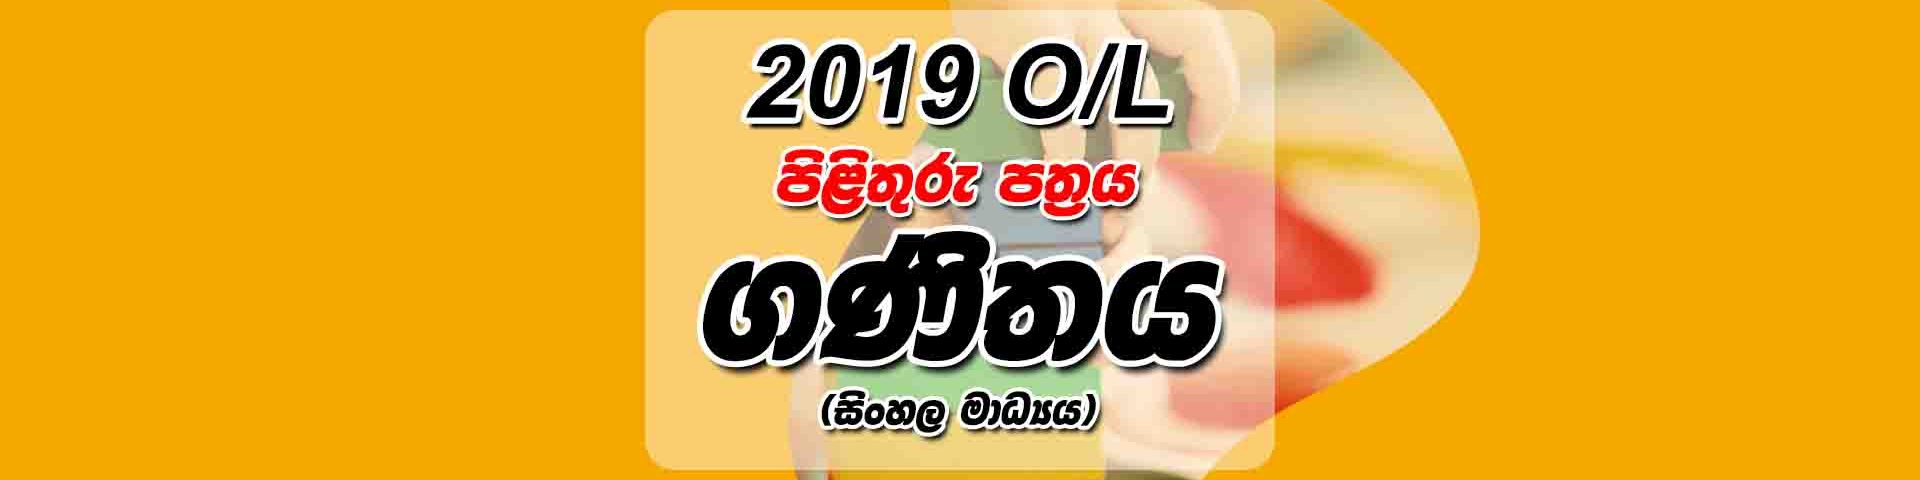 Download 2019 O/L Maths Marking Scheme Sinhala Medium